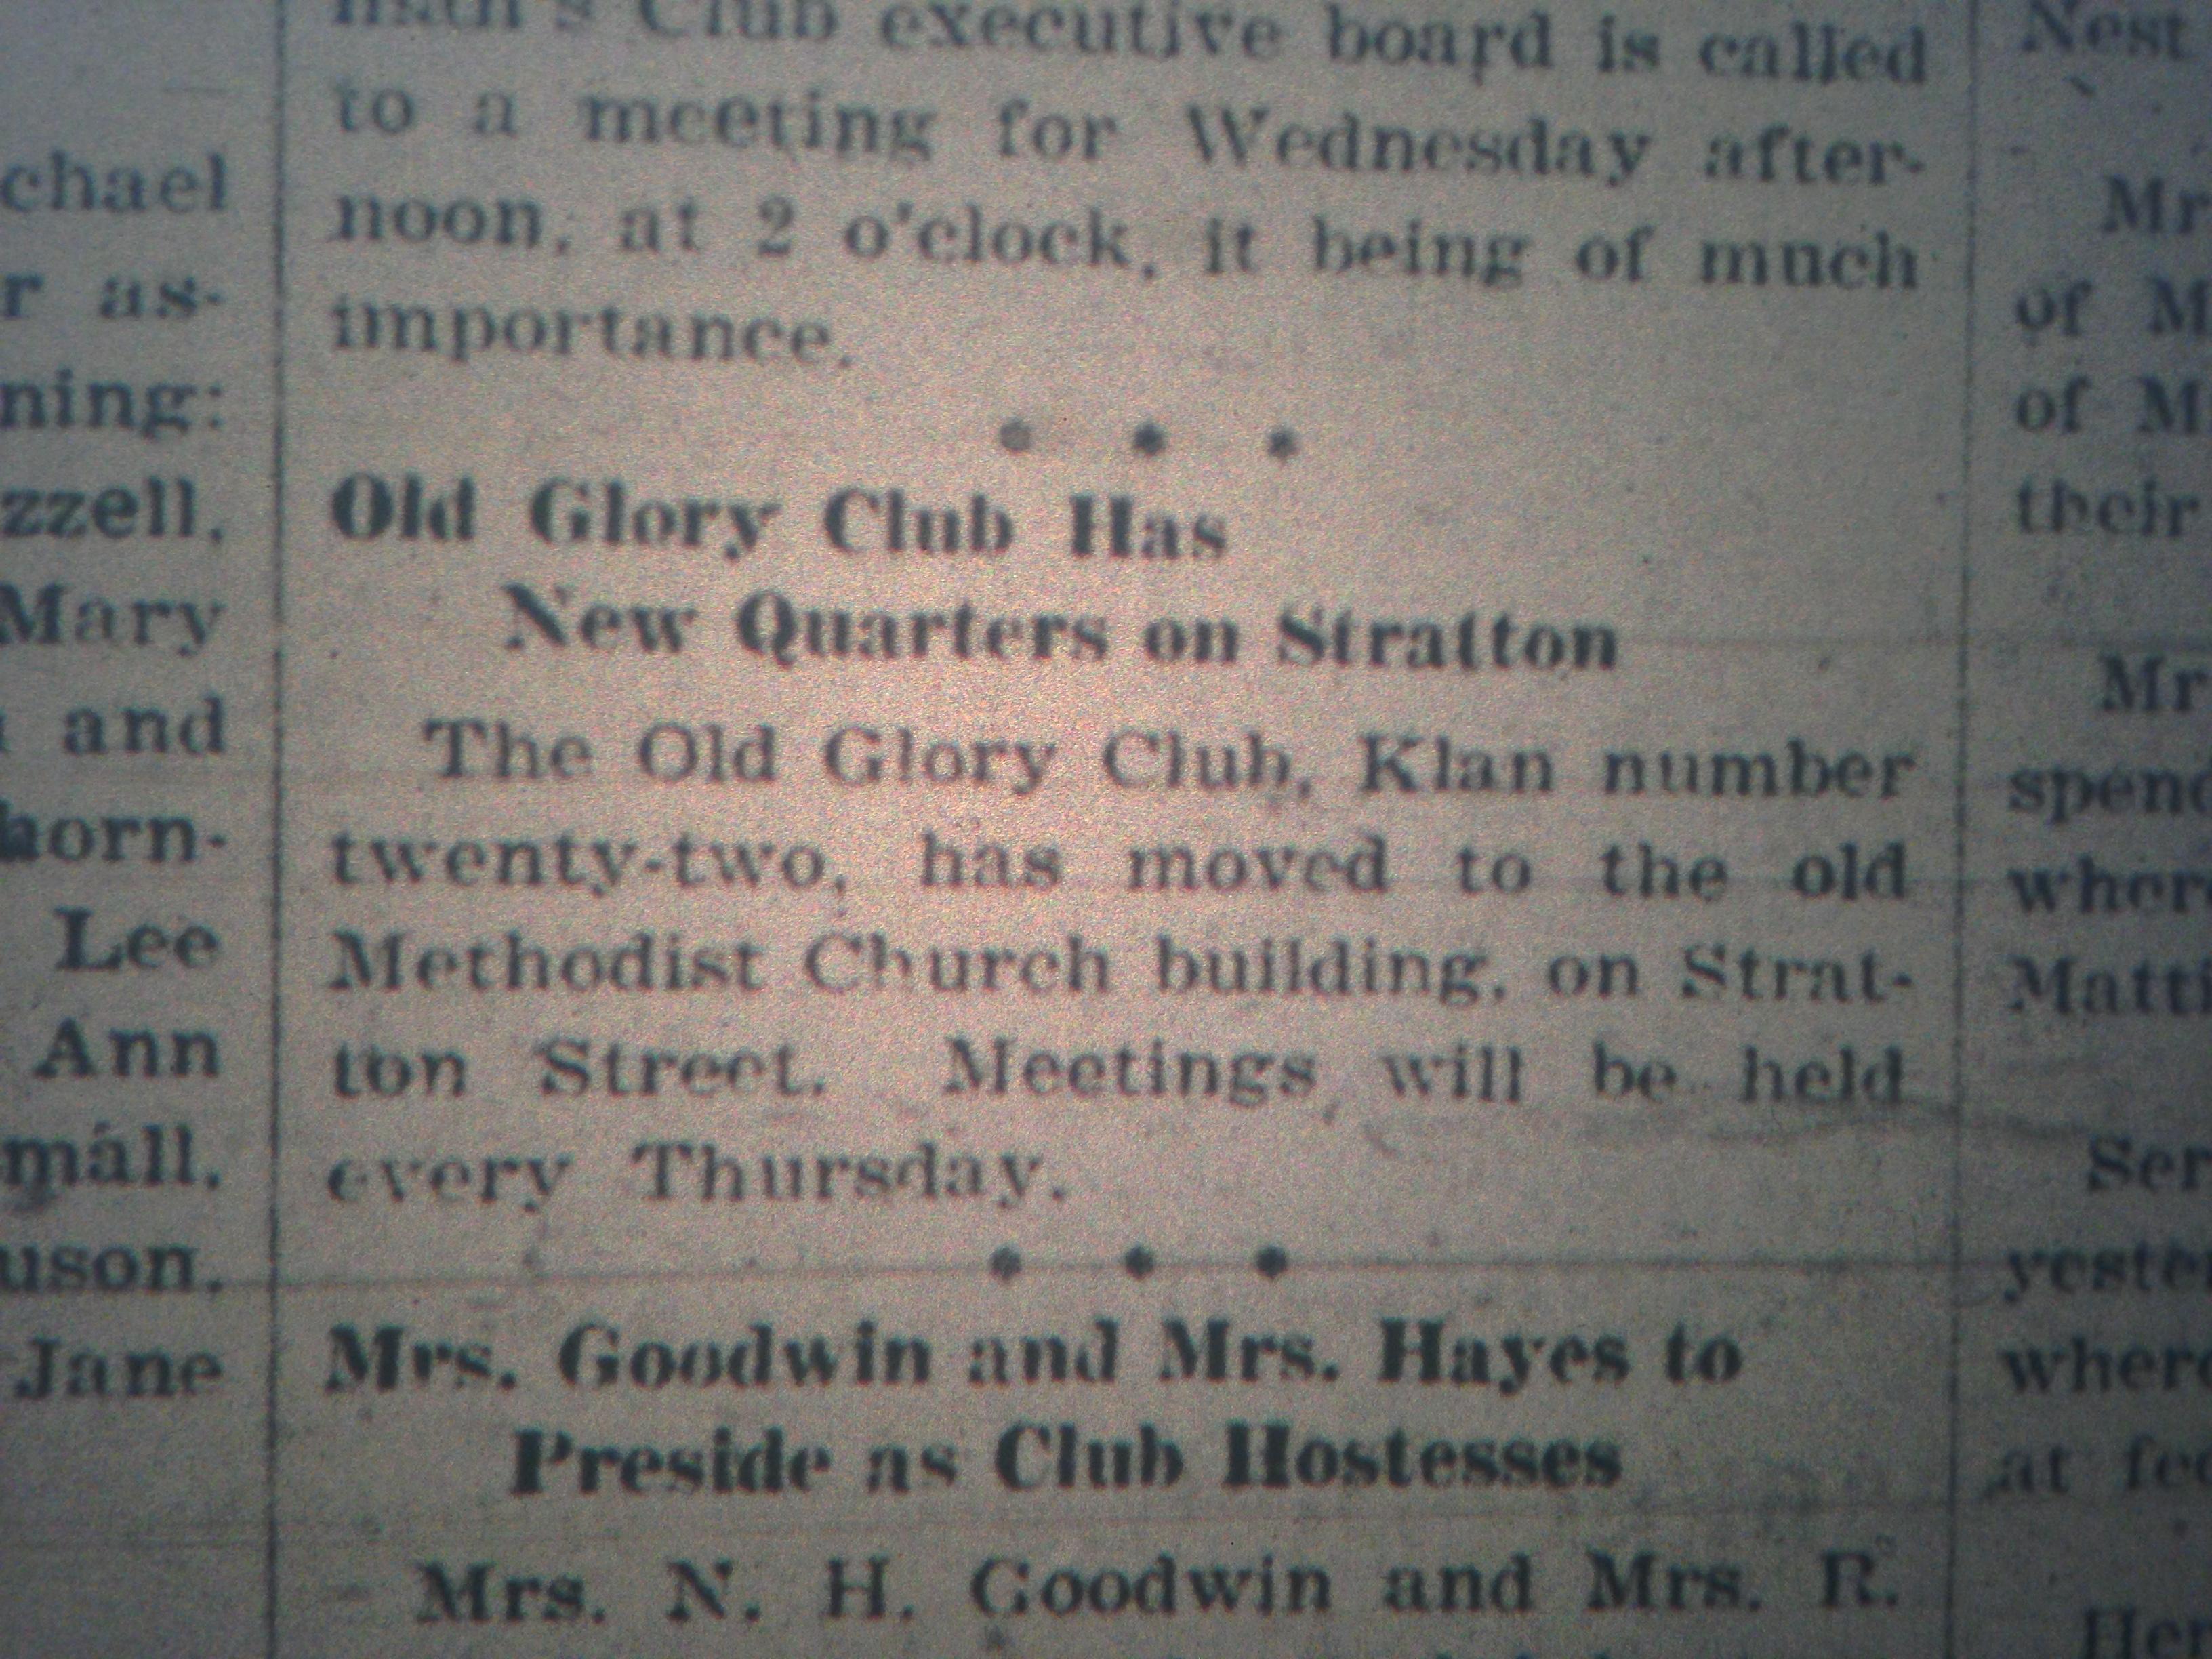 KKK Headquarters in Logan LB 01.17.1928